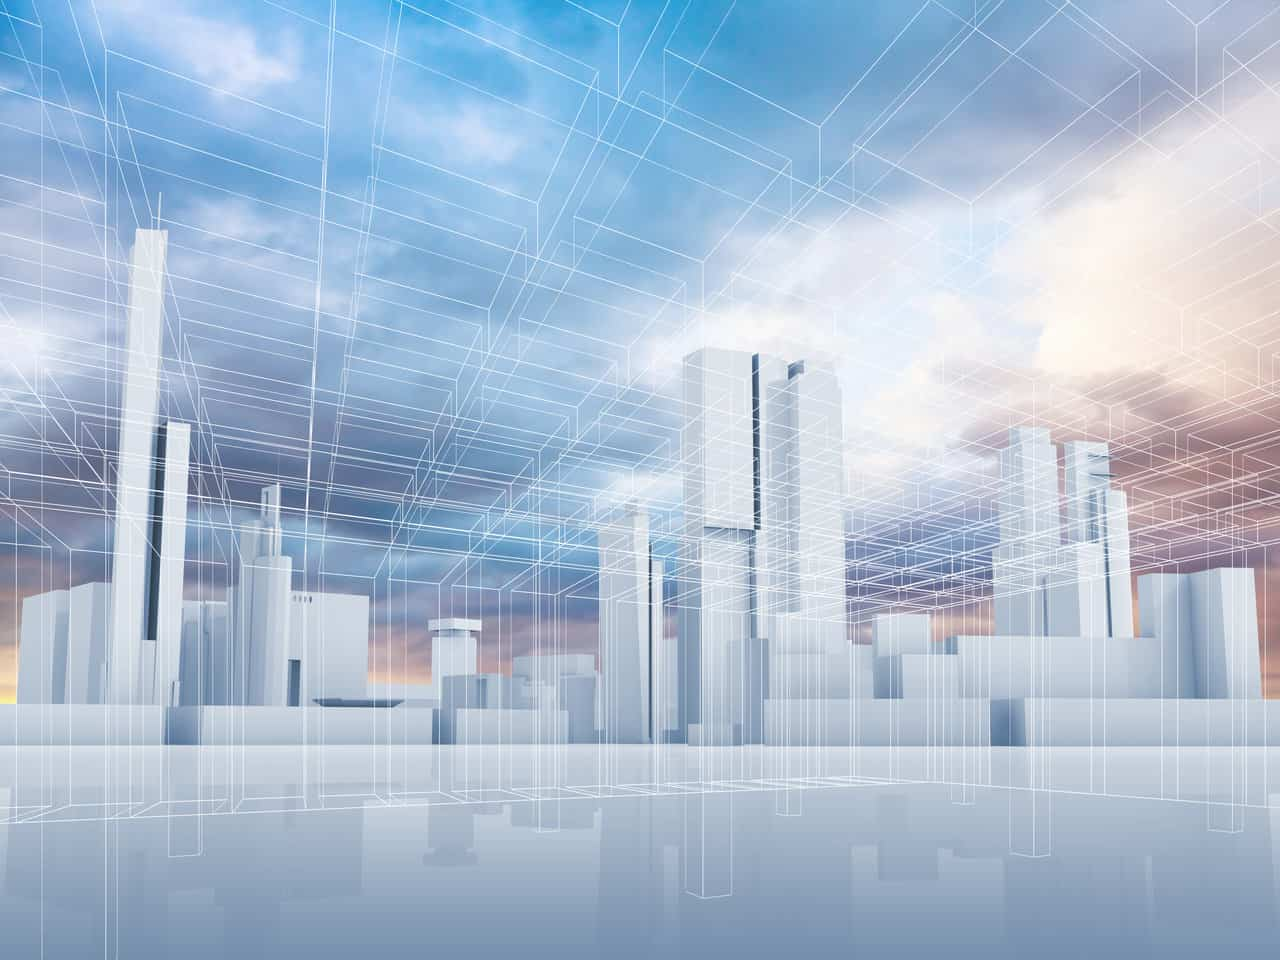 construction engineering news, BIM jobs, BIM modelling, BIM Manager, BIM Co-Ordinator, BIM Technician